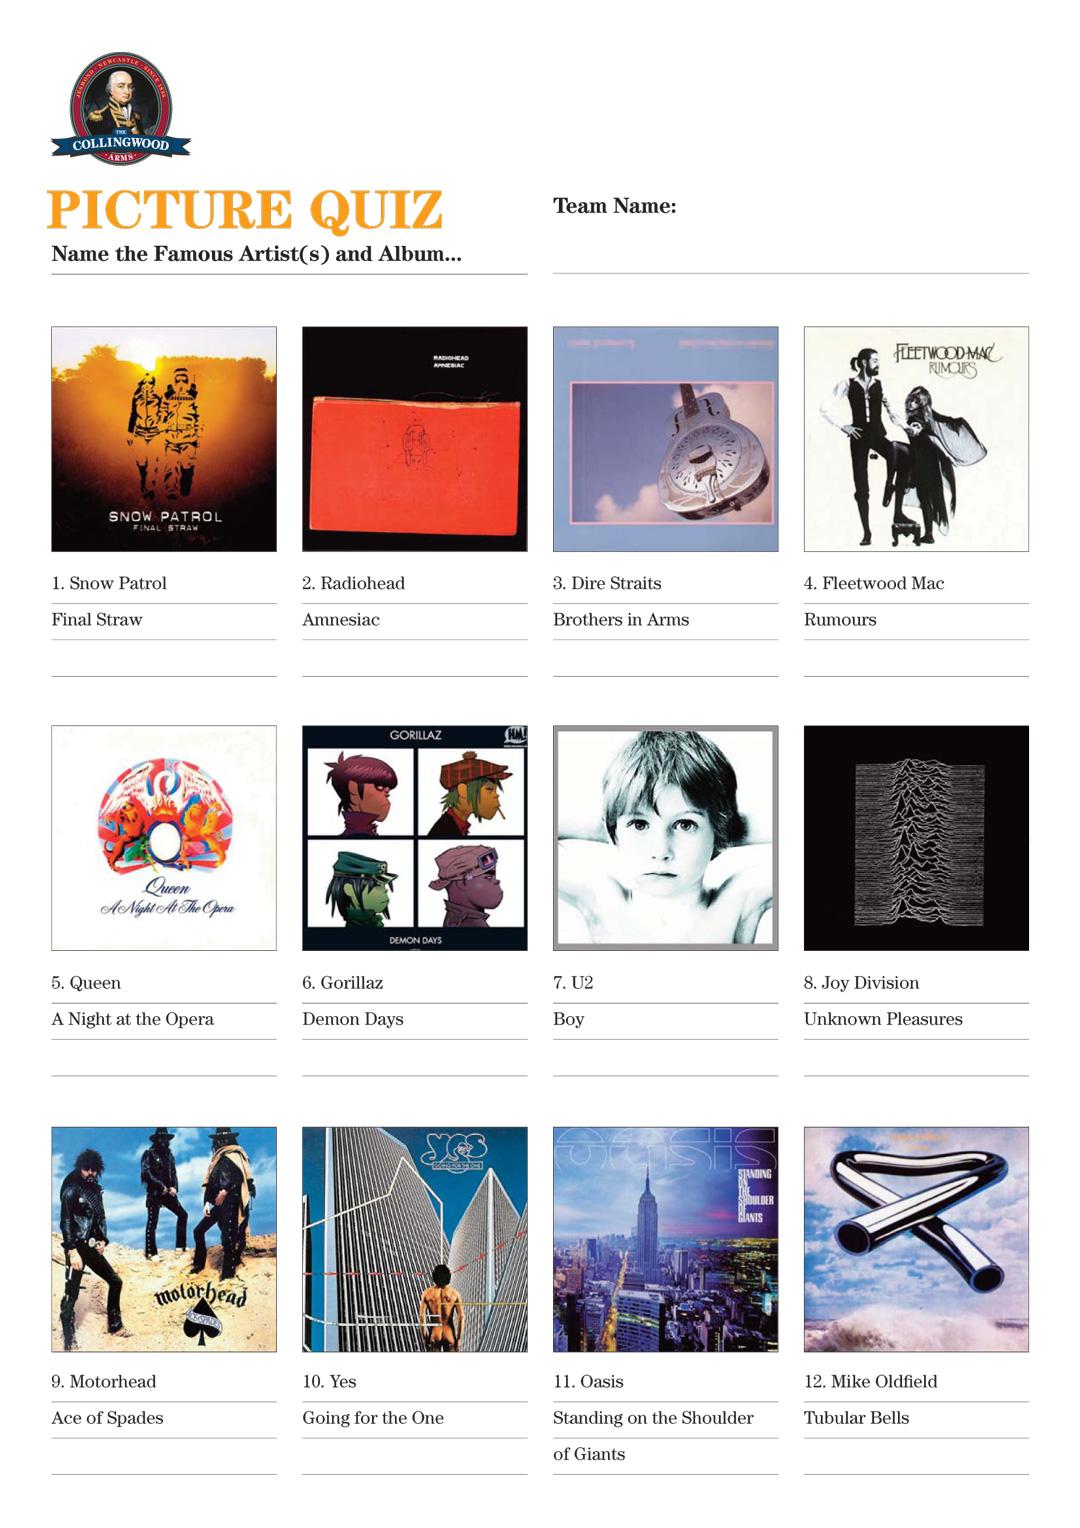 http://4.bp.blogspot.com/-gjyjXcKy52U/T8YfS7SK9oI/AAAAAAAAAXM/XTdN1IIaI1k/s1600/Album-Covers-Pic-Quiz-2.jpg